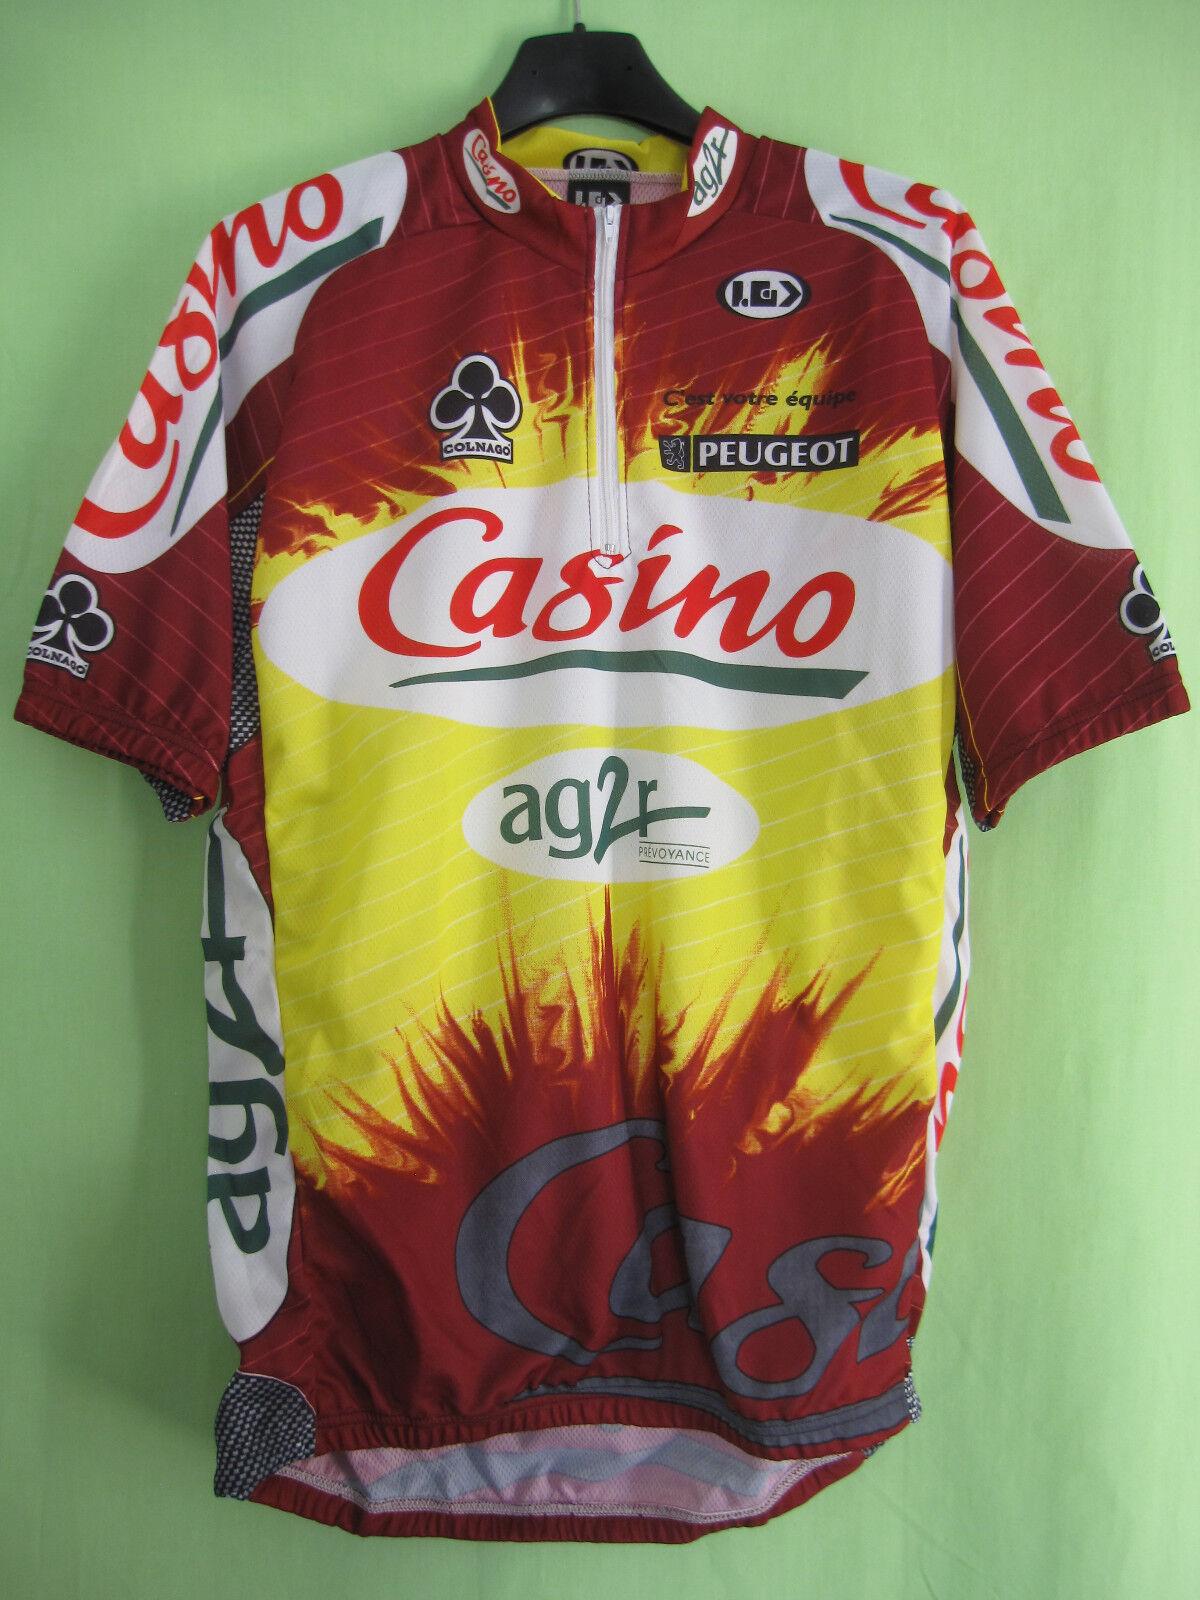 Maillot cycliste Casino Ag2r Tour 1998 Colnago Peugeot vintage jersey - XL